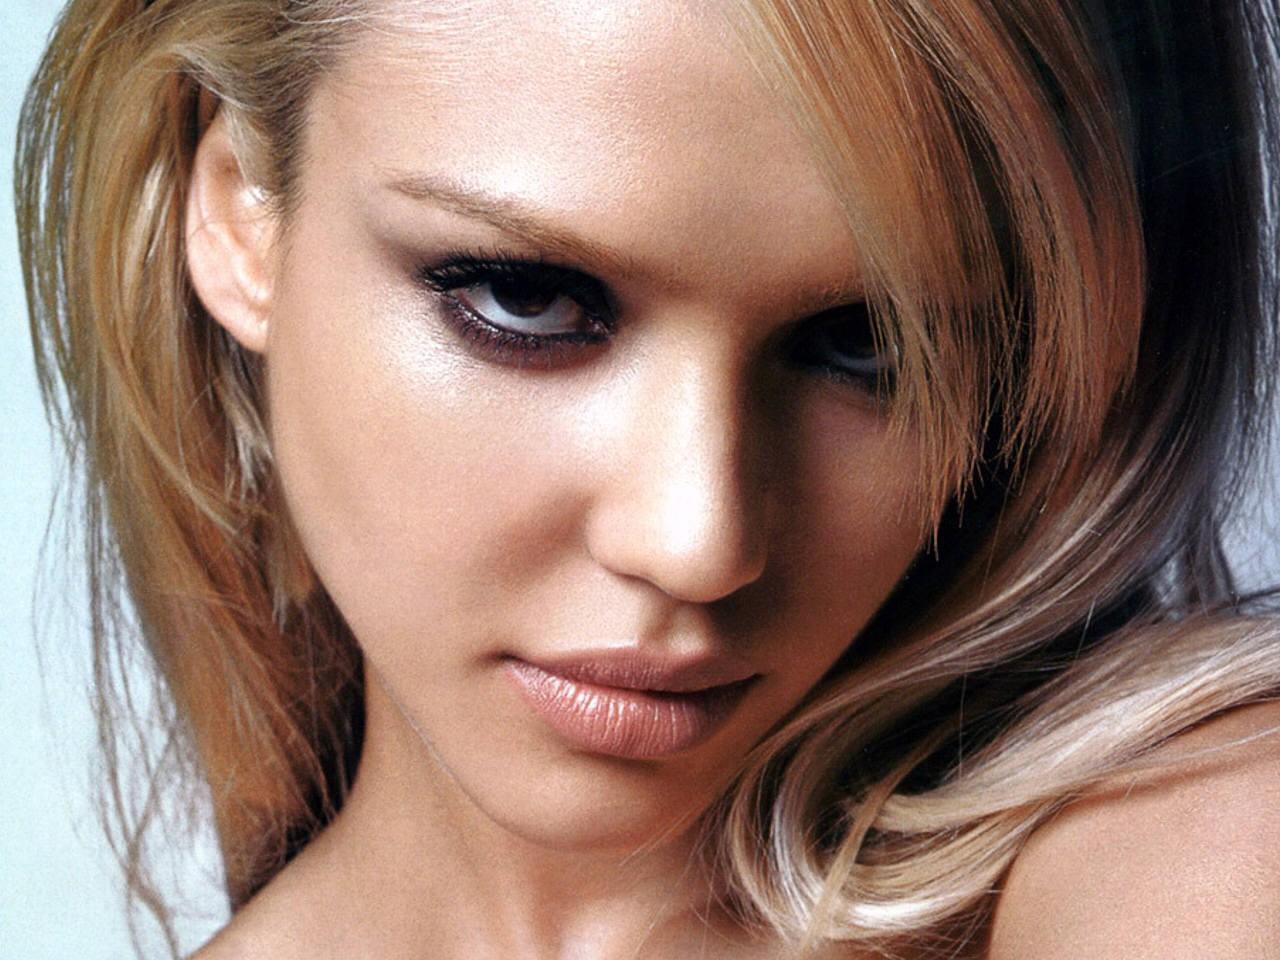 Wallpaper Face Women Model Singer Blue Mouth Nose: Wallpaper : Face, Women, Model, Portrait, Long Hair